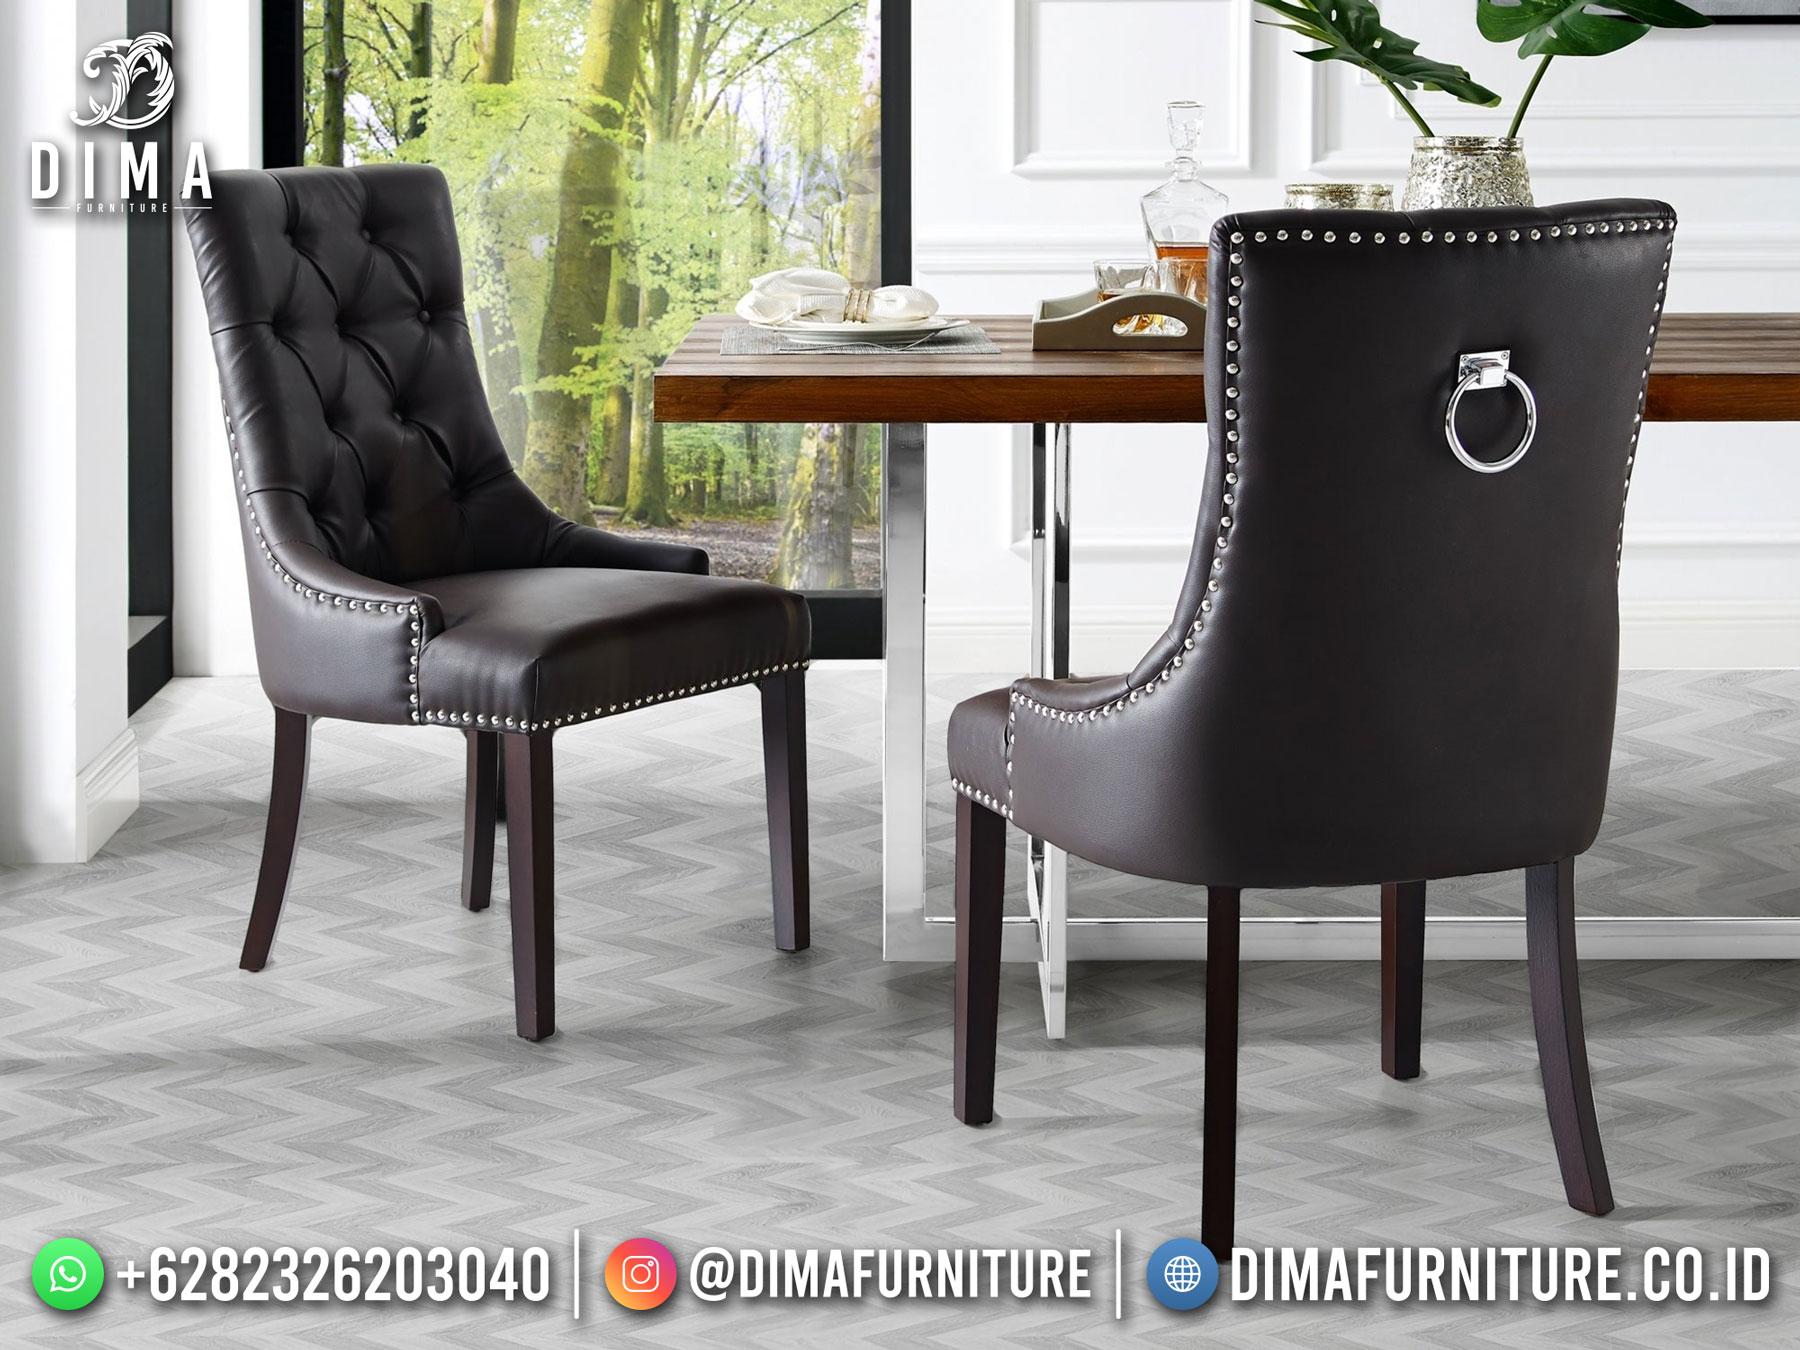 New Kursi Makan Minimalis Set Meja Makan Modern Luxury Design TTJ-1766